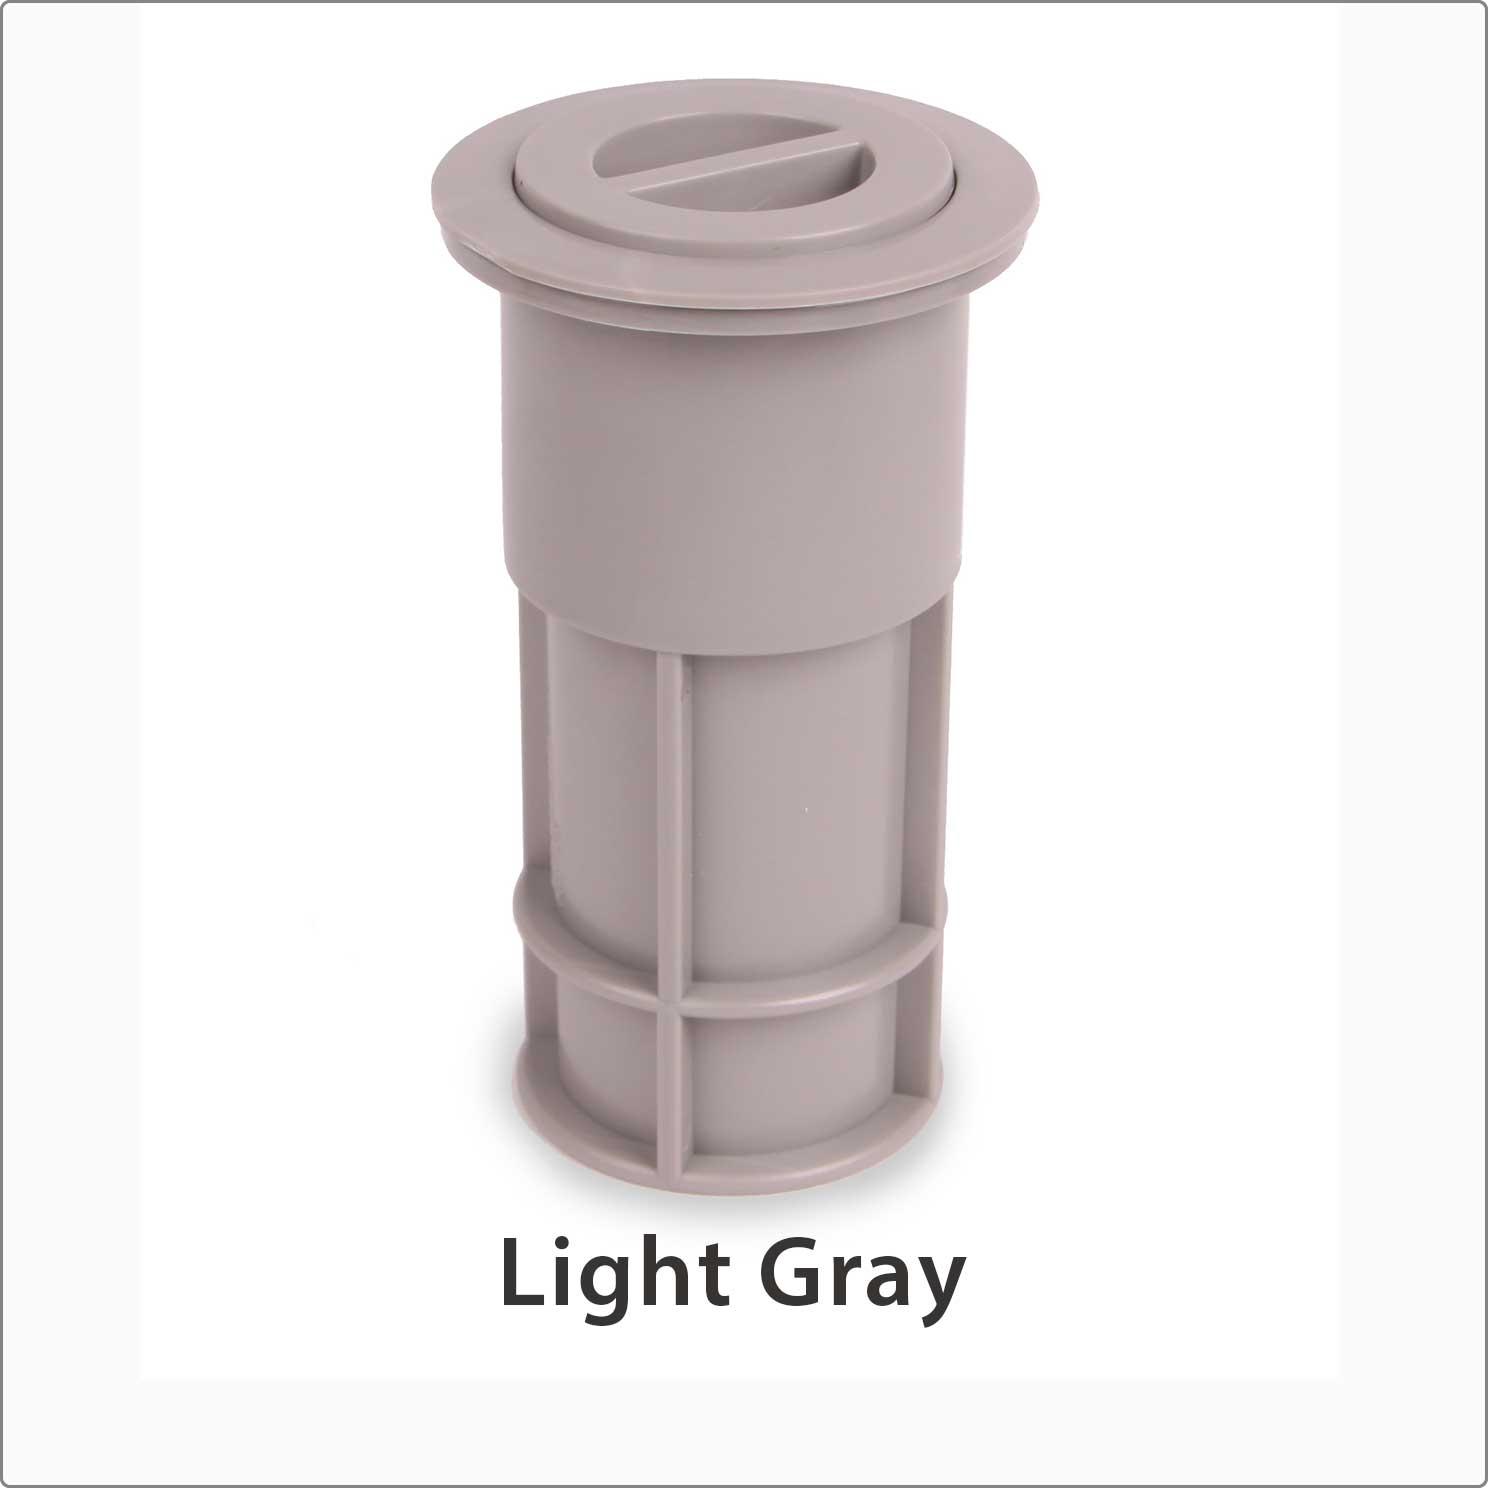 Pole-Holder-Light-Gray.jpg